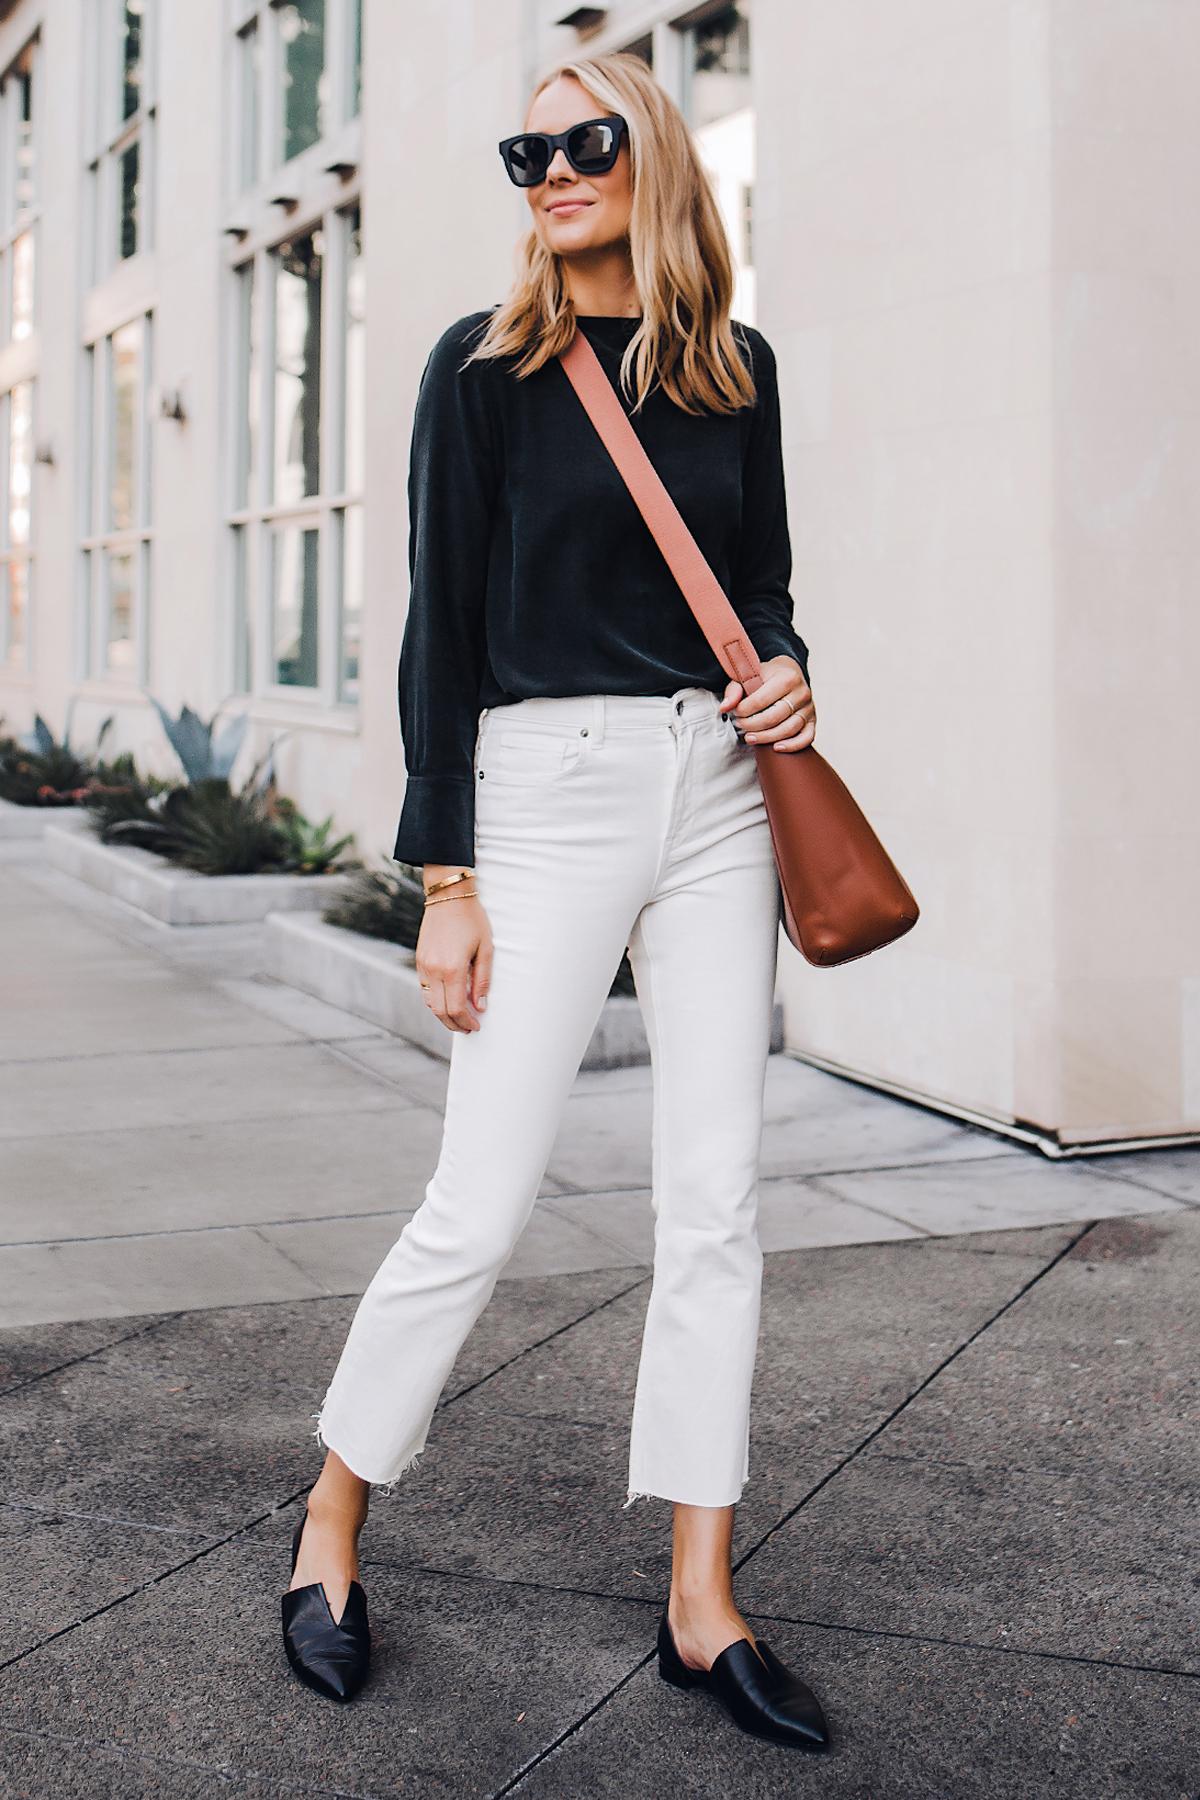 Fashion-Jackson-Everlane-Black-Silk-Long-Sleeve-Top-Everlane-White-Cropped-Jeans-Everlane-Brown-Messenger-Bag-Vince-Black-Flats